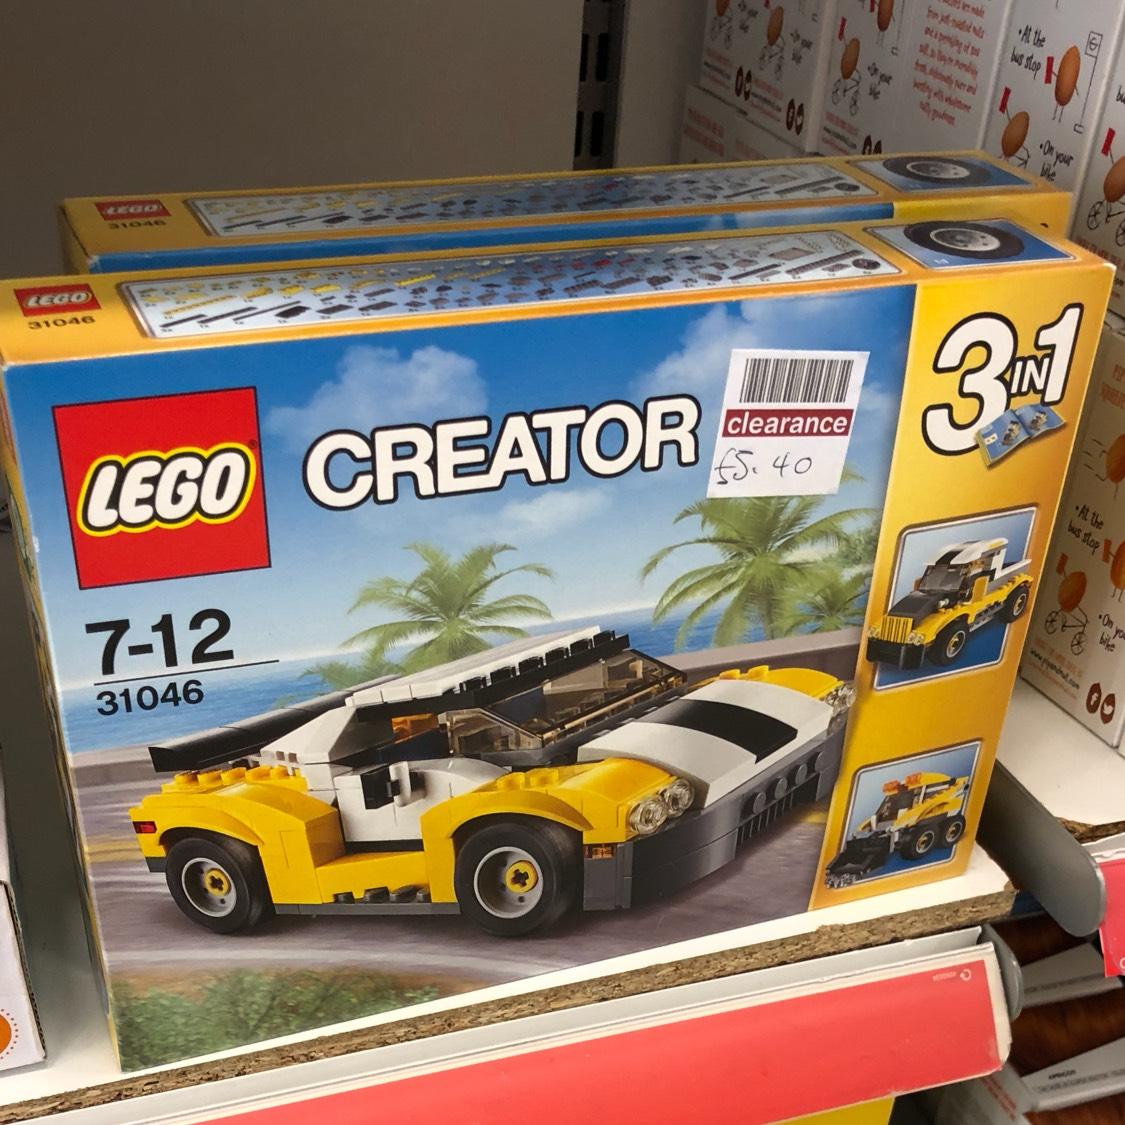 Lego creator fast car £5.40 boots crayford